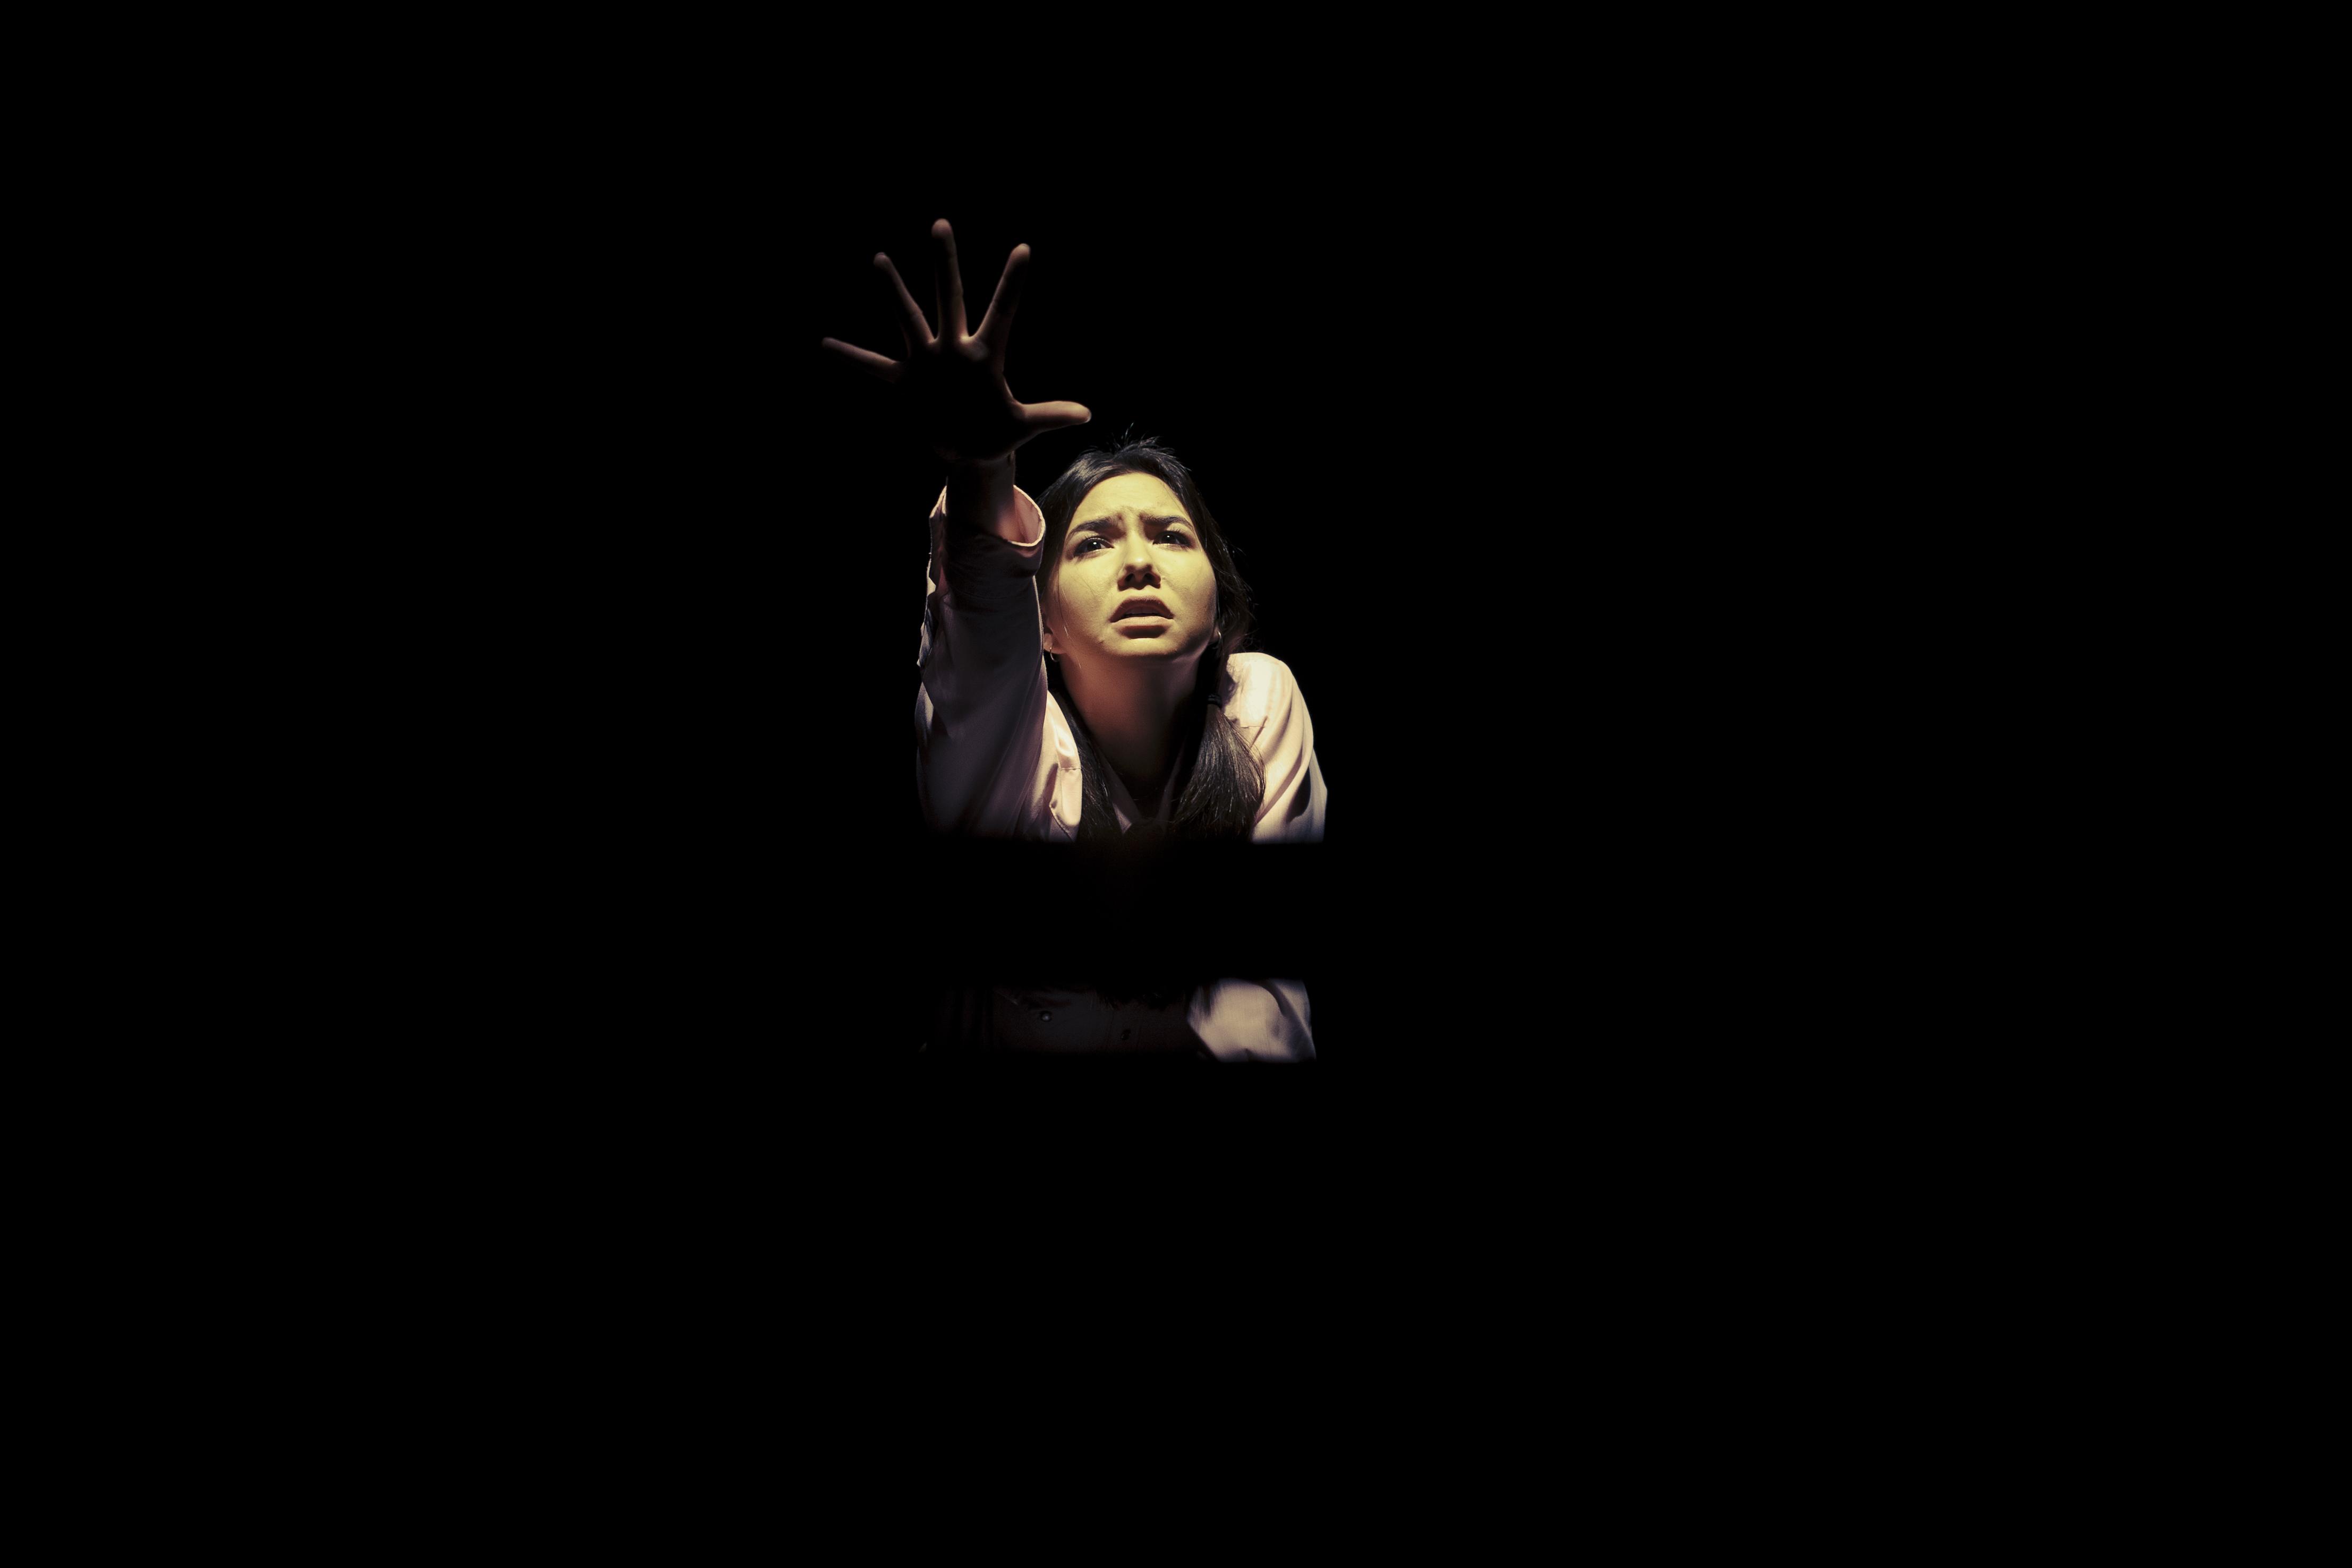 Sera-Lys McArthur by Juan Camilo Palacio from the NEPA 2013 production. design Moro, direction/writing Beagan.